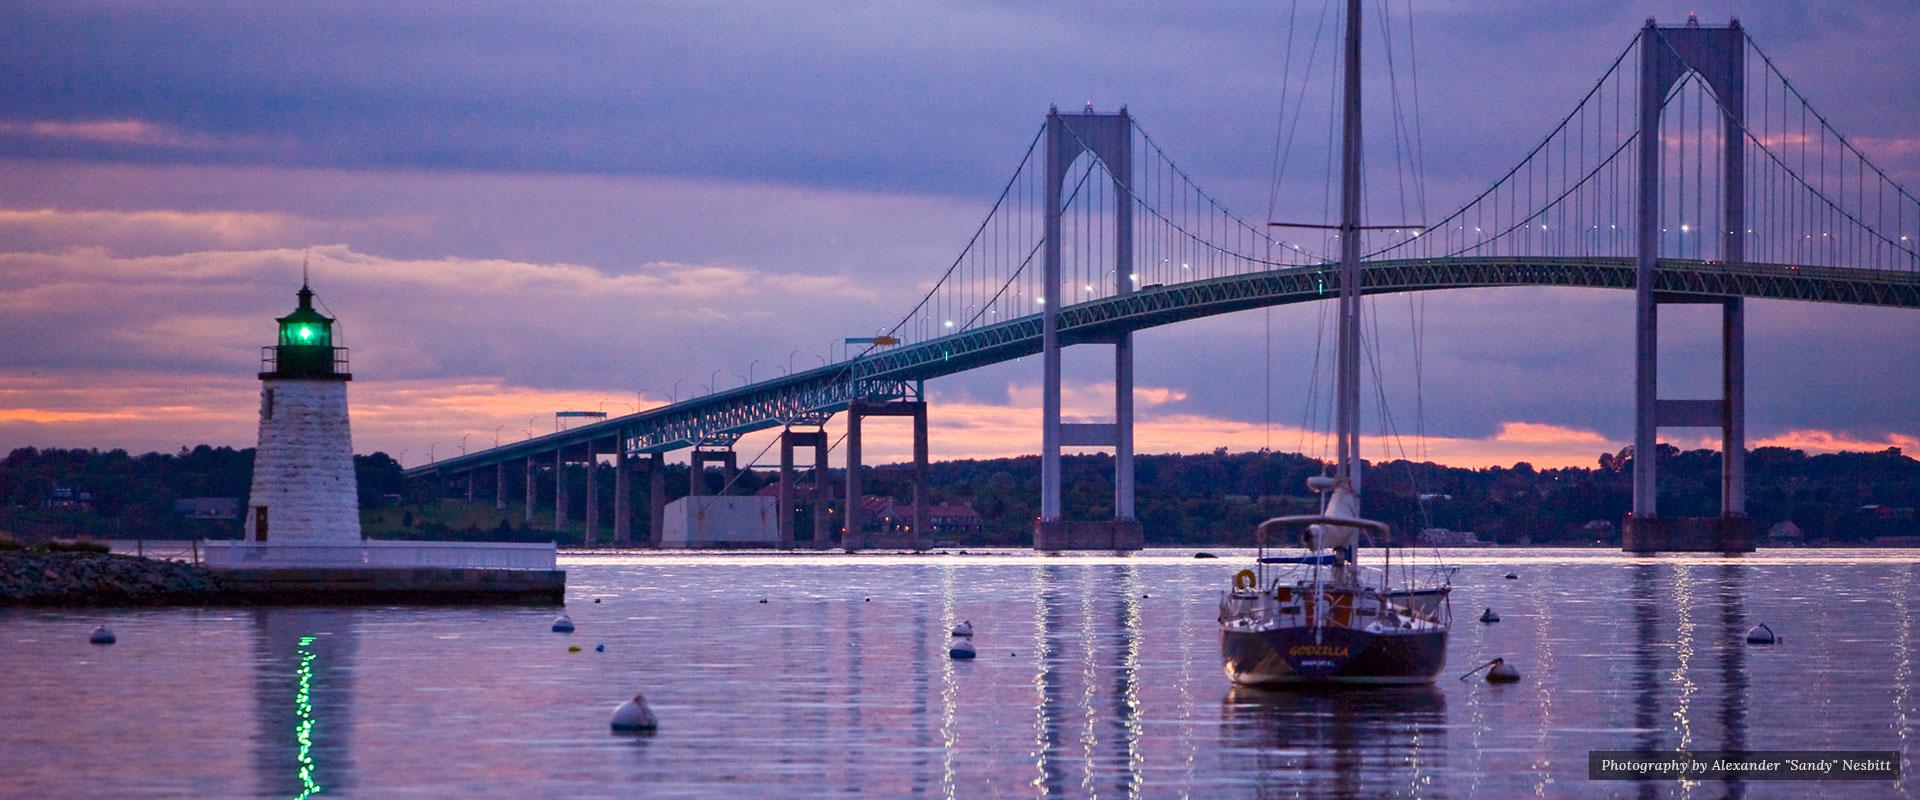 The lighthouse infront of the bridge | Newport Inns of Rhode Island